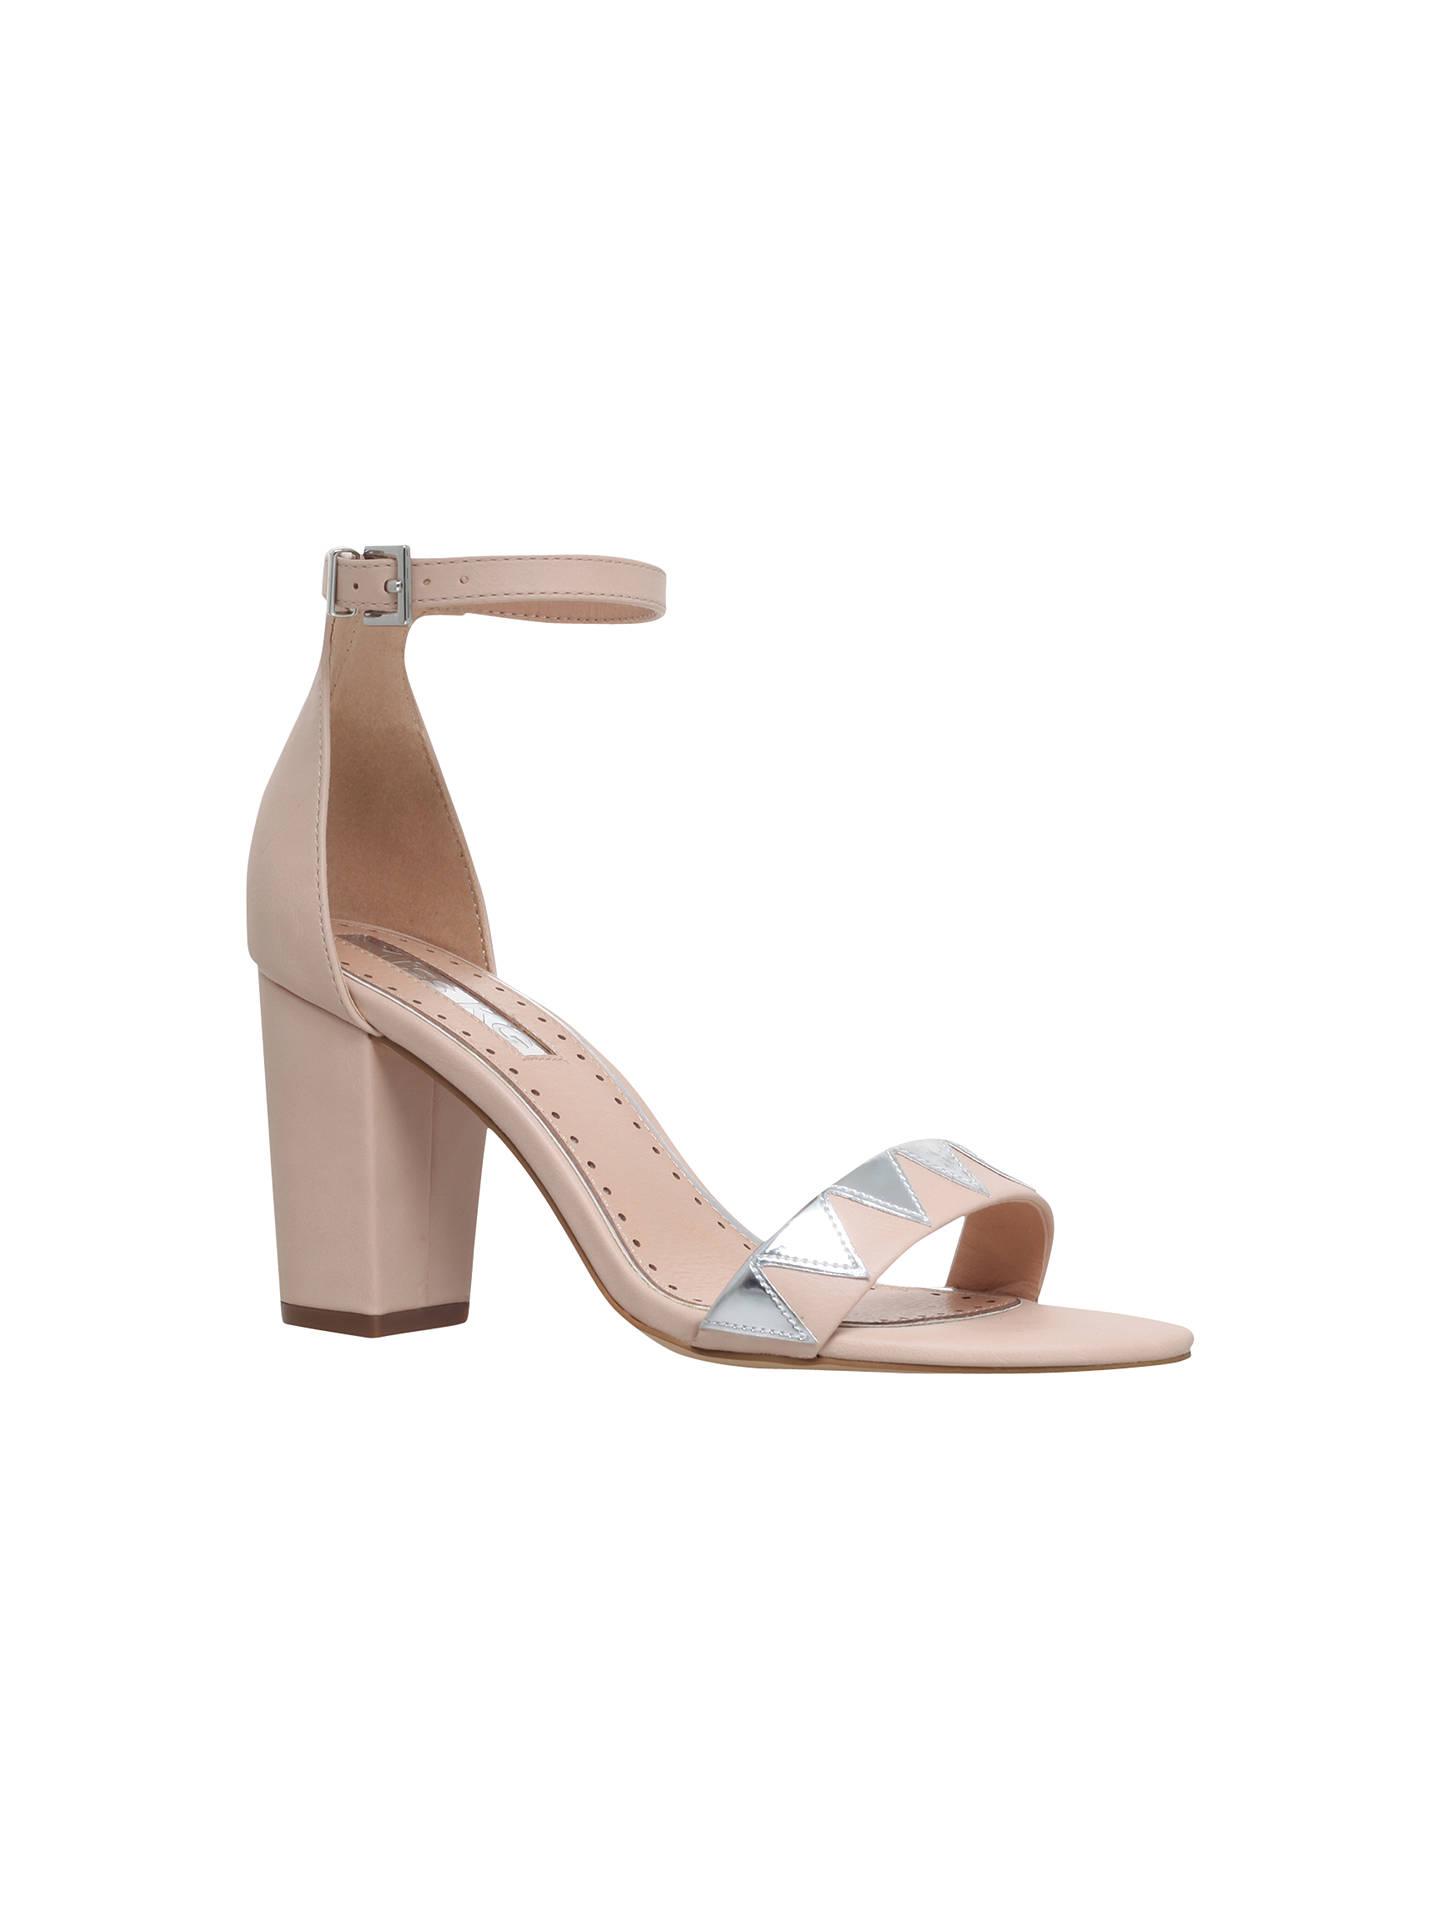 568aa4dcd31 Miss KG Faye Block Heeled Sandals, Nude at John Lewis & Partners